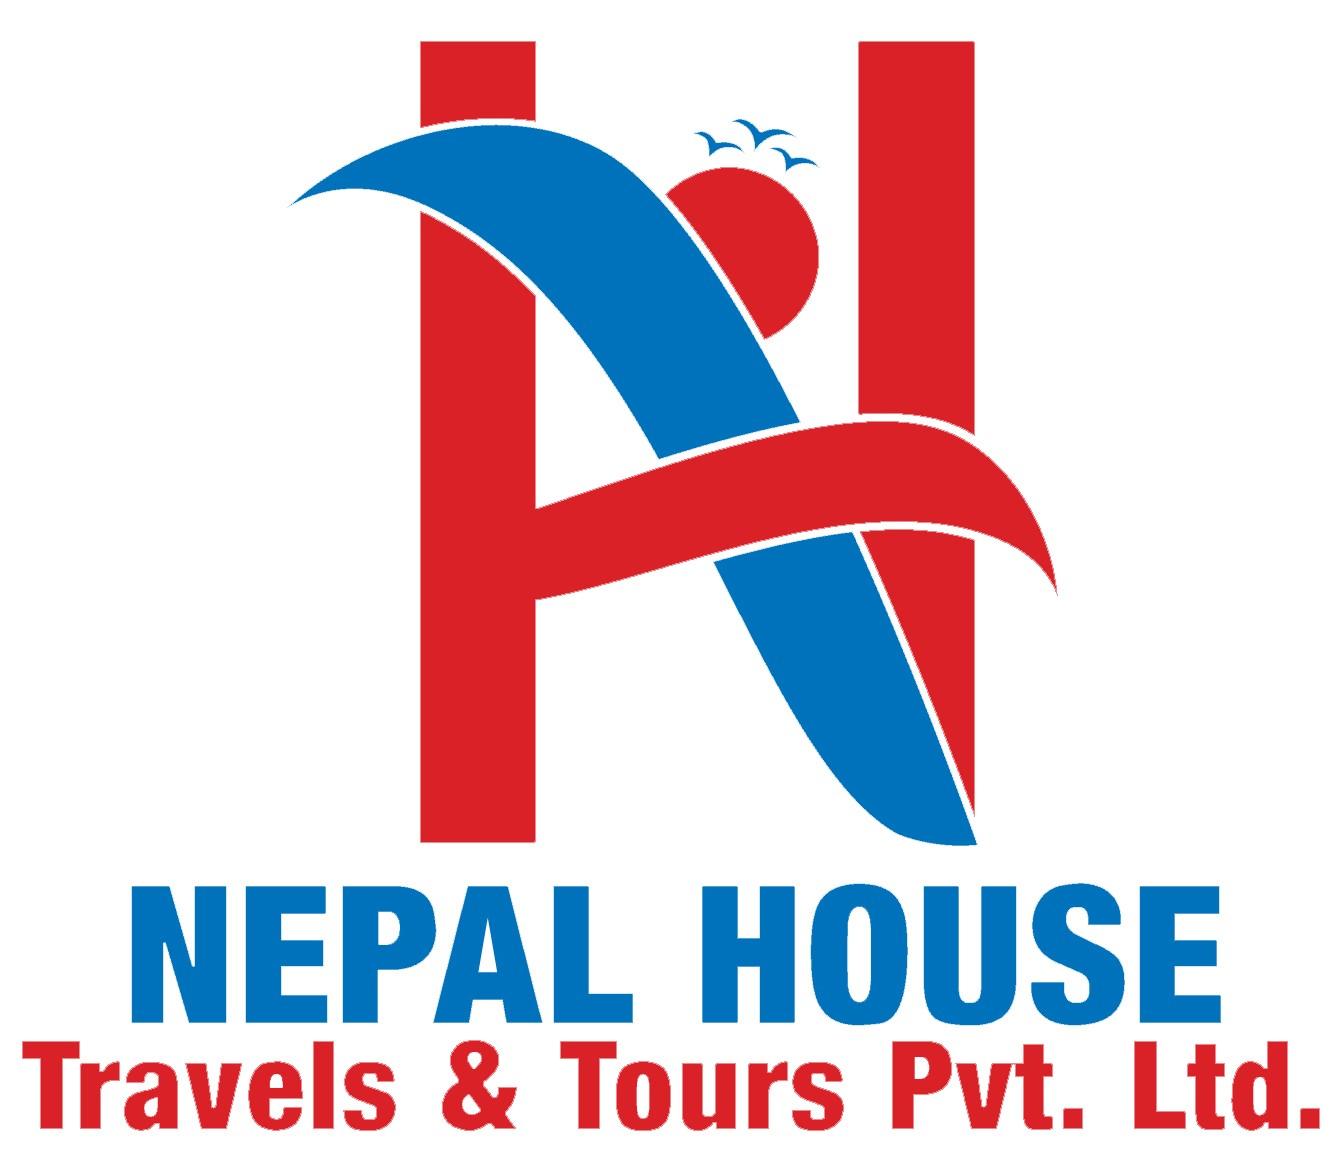 Nepal House Travels & Tours Pvt. Ltd